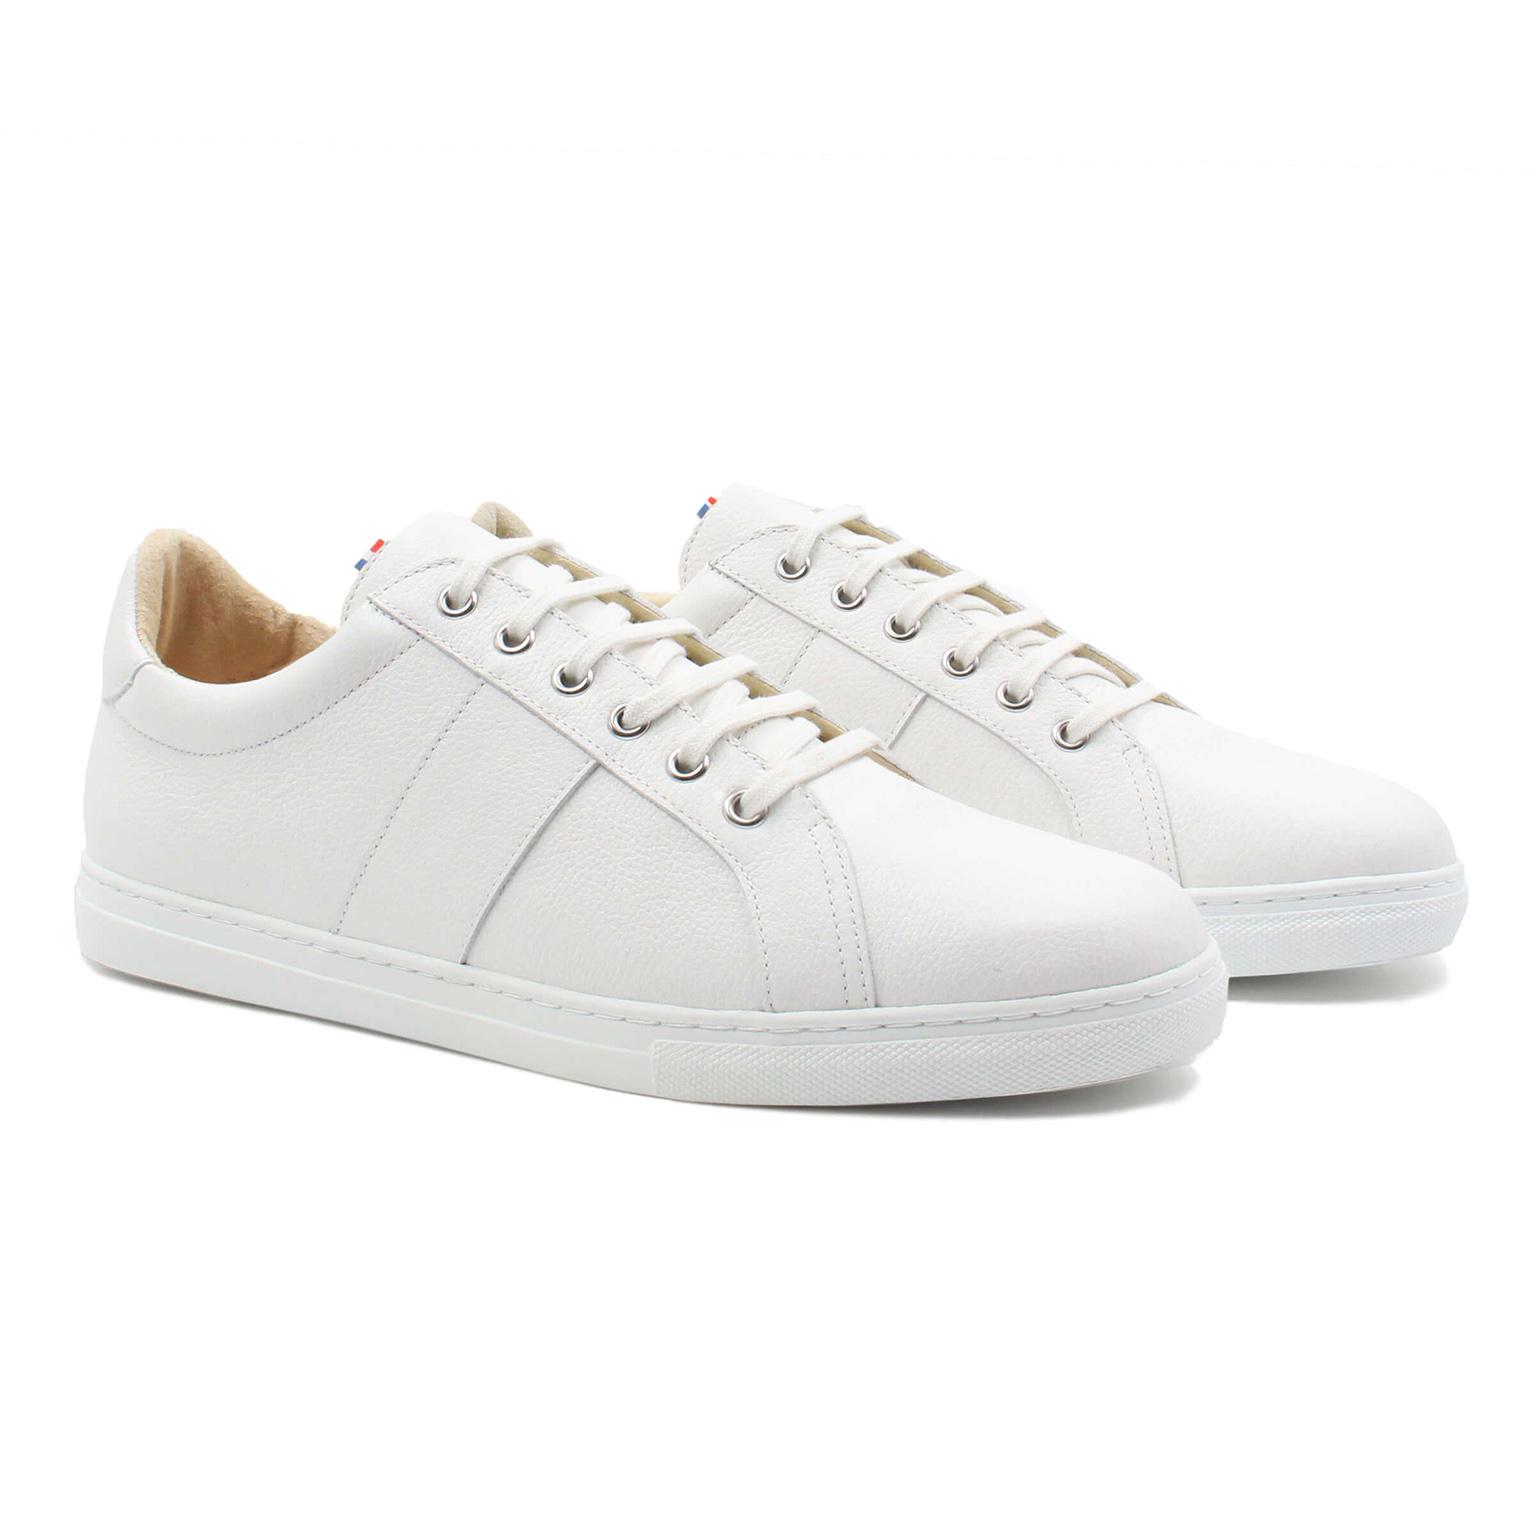 sneakers jules jenn